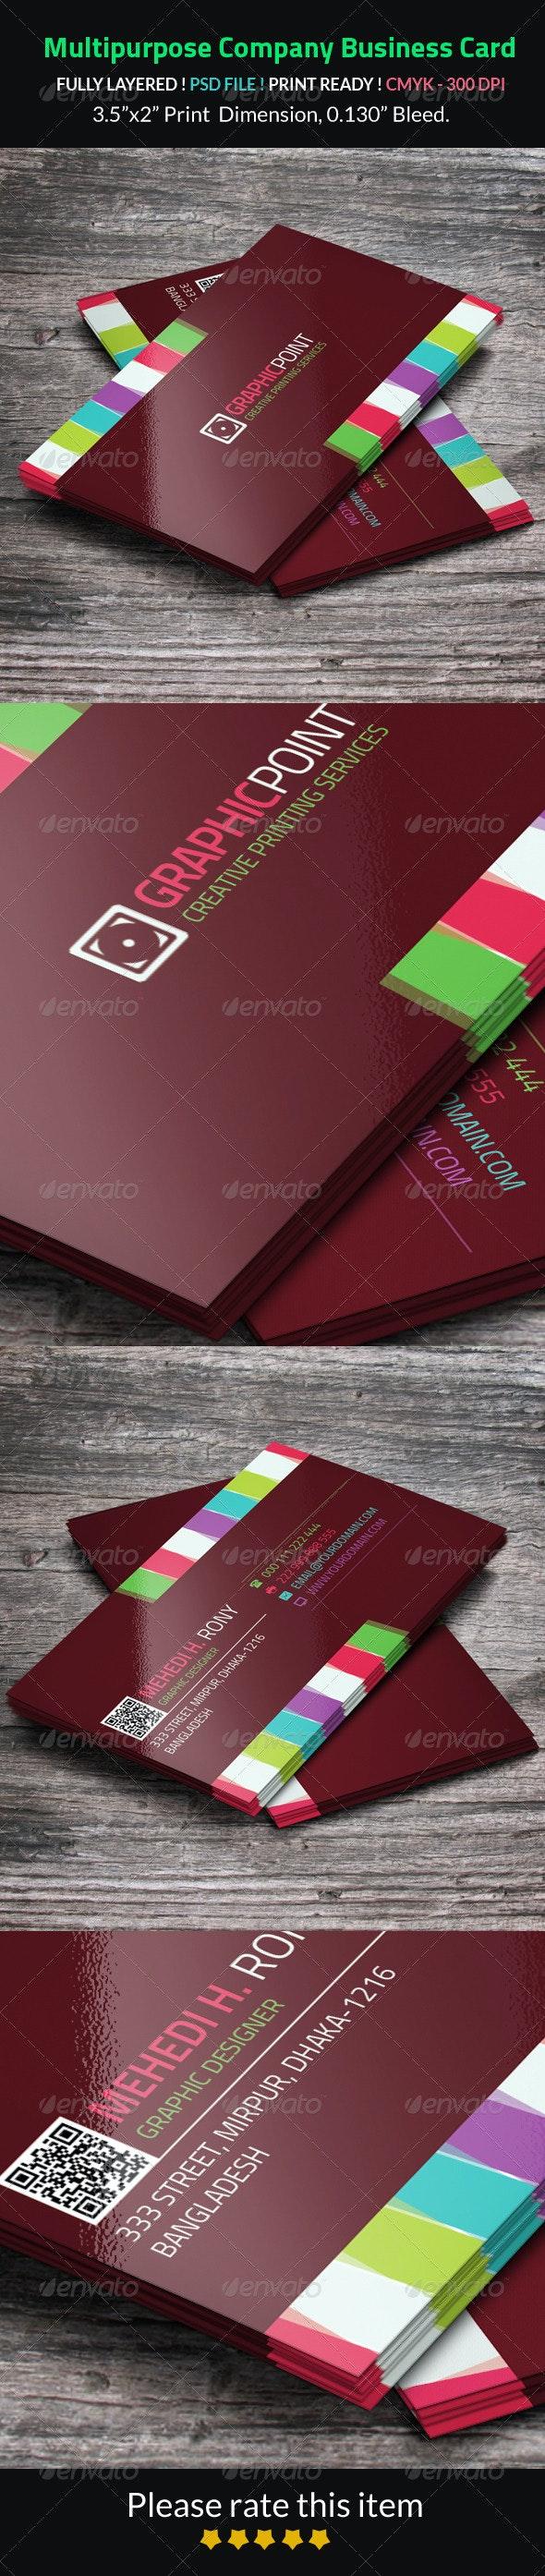 Multipurpose Company Business Card - Corporate Business Cards